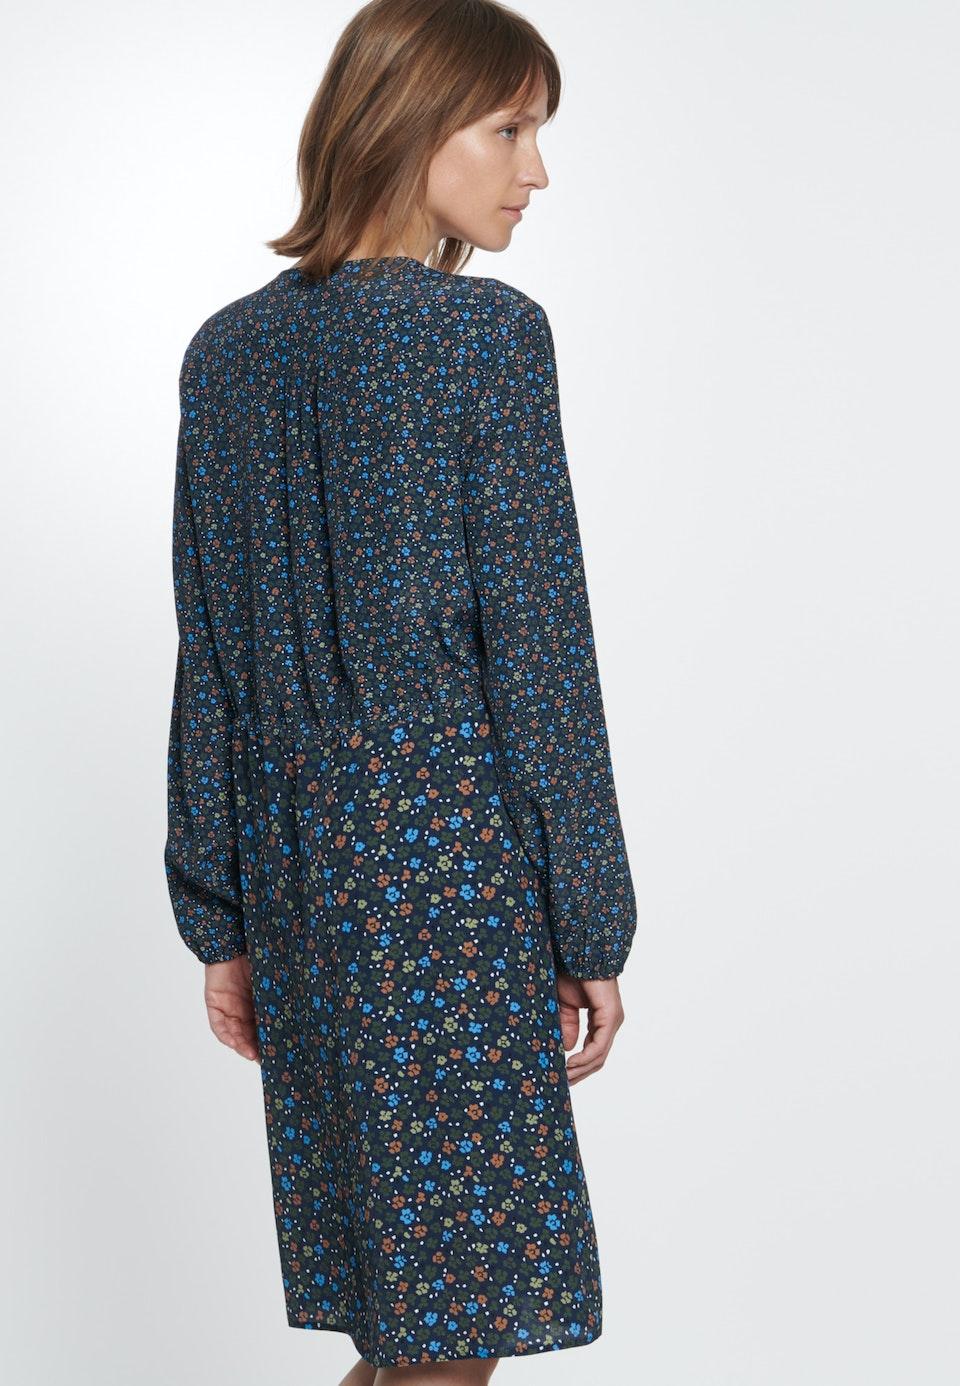 Damen Chiffon Midi Kleid aus 100% Viskose dunkelblau 60 ...